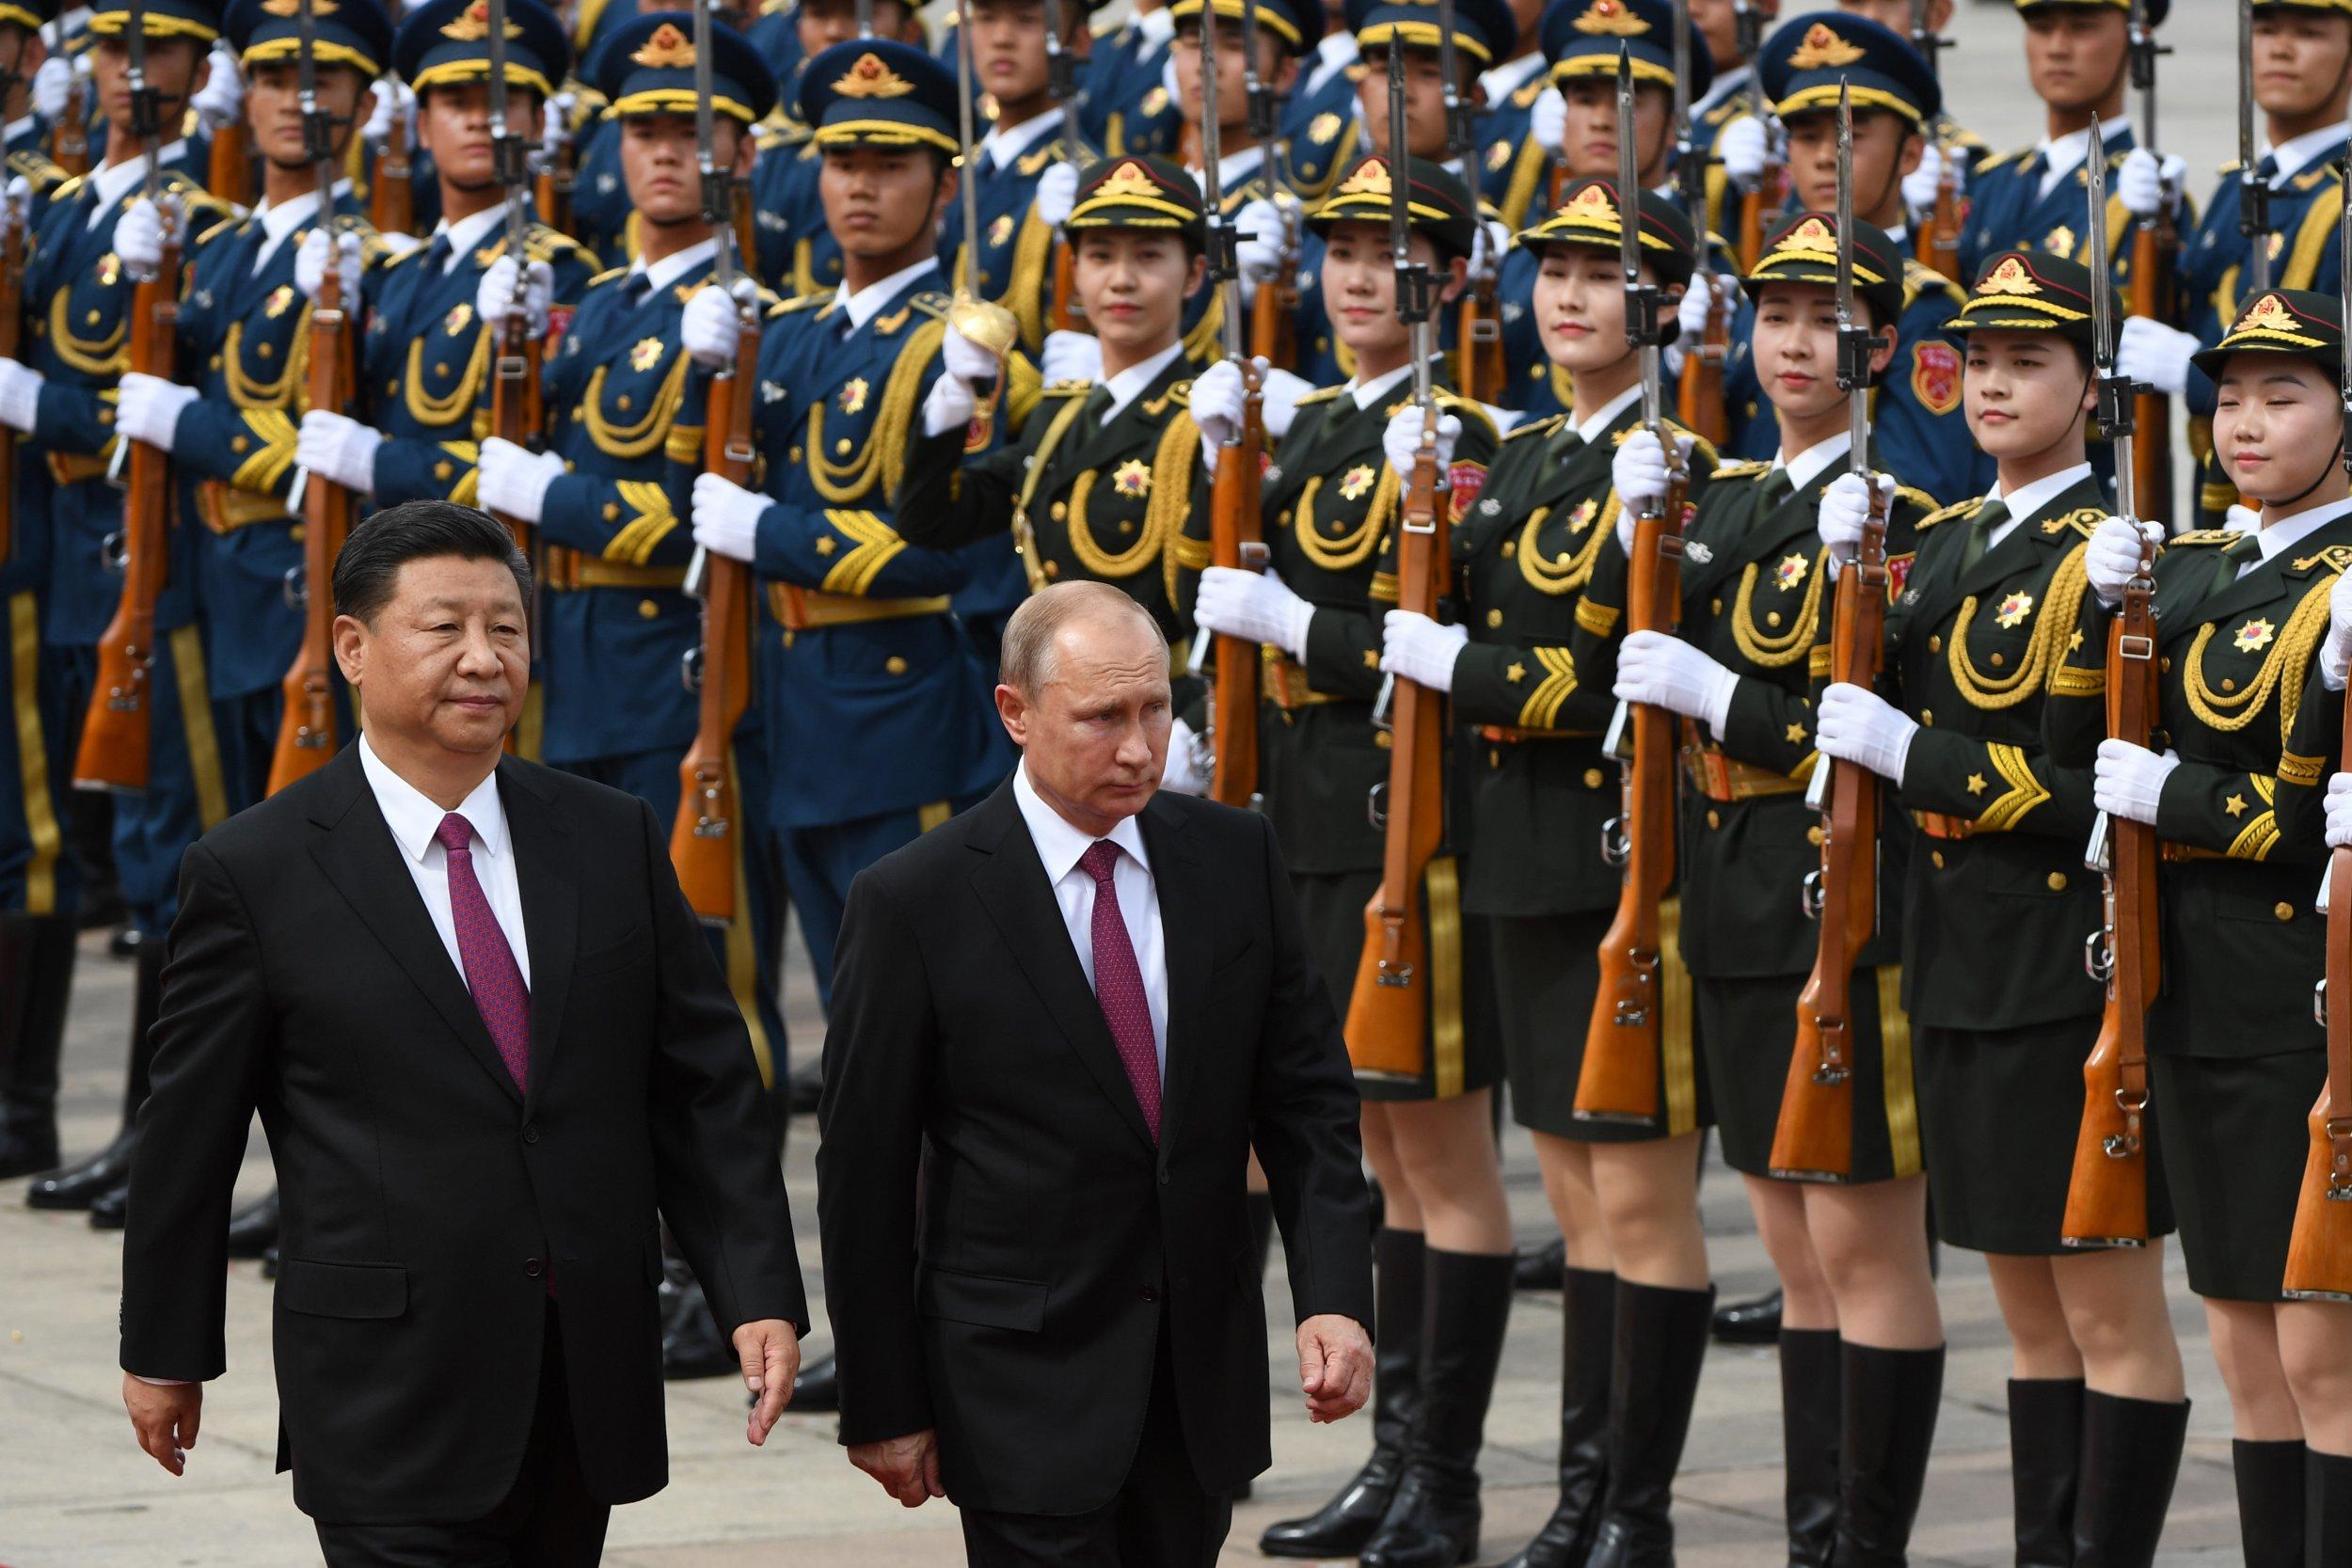 Vladimir Putin Xi Jinping China Russia